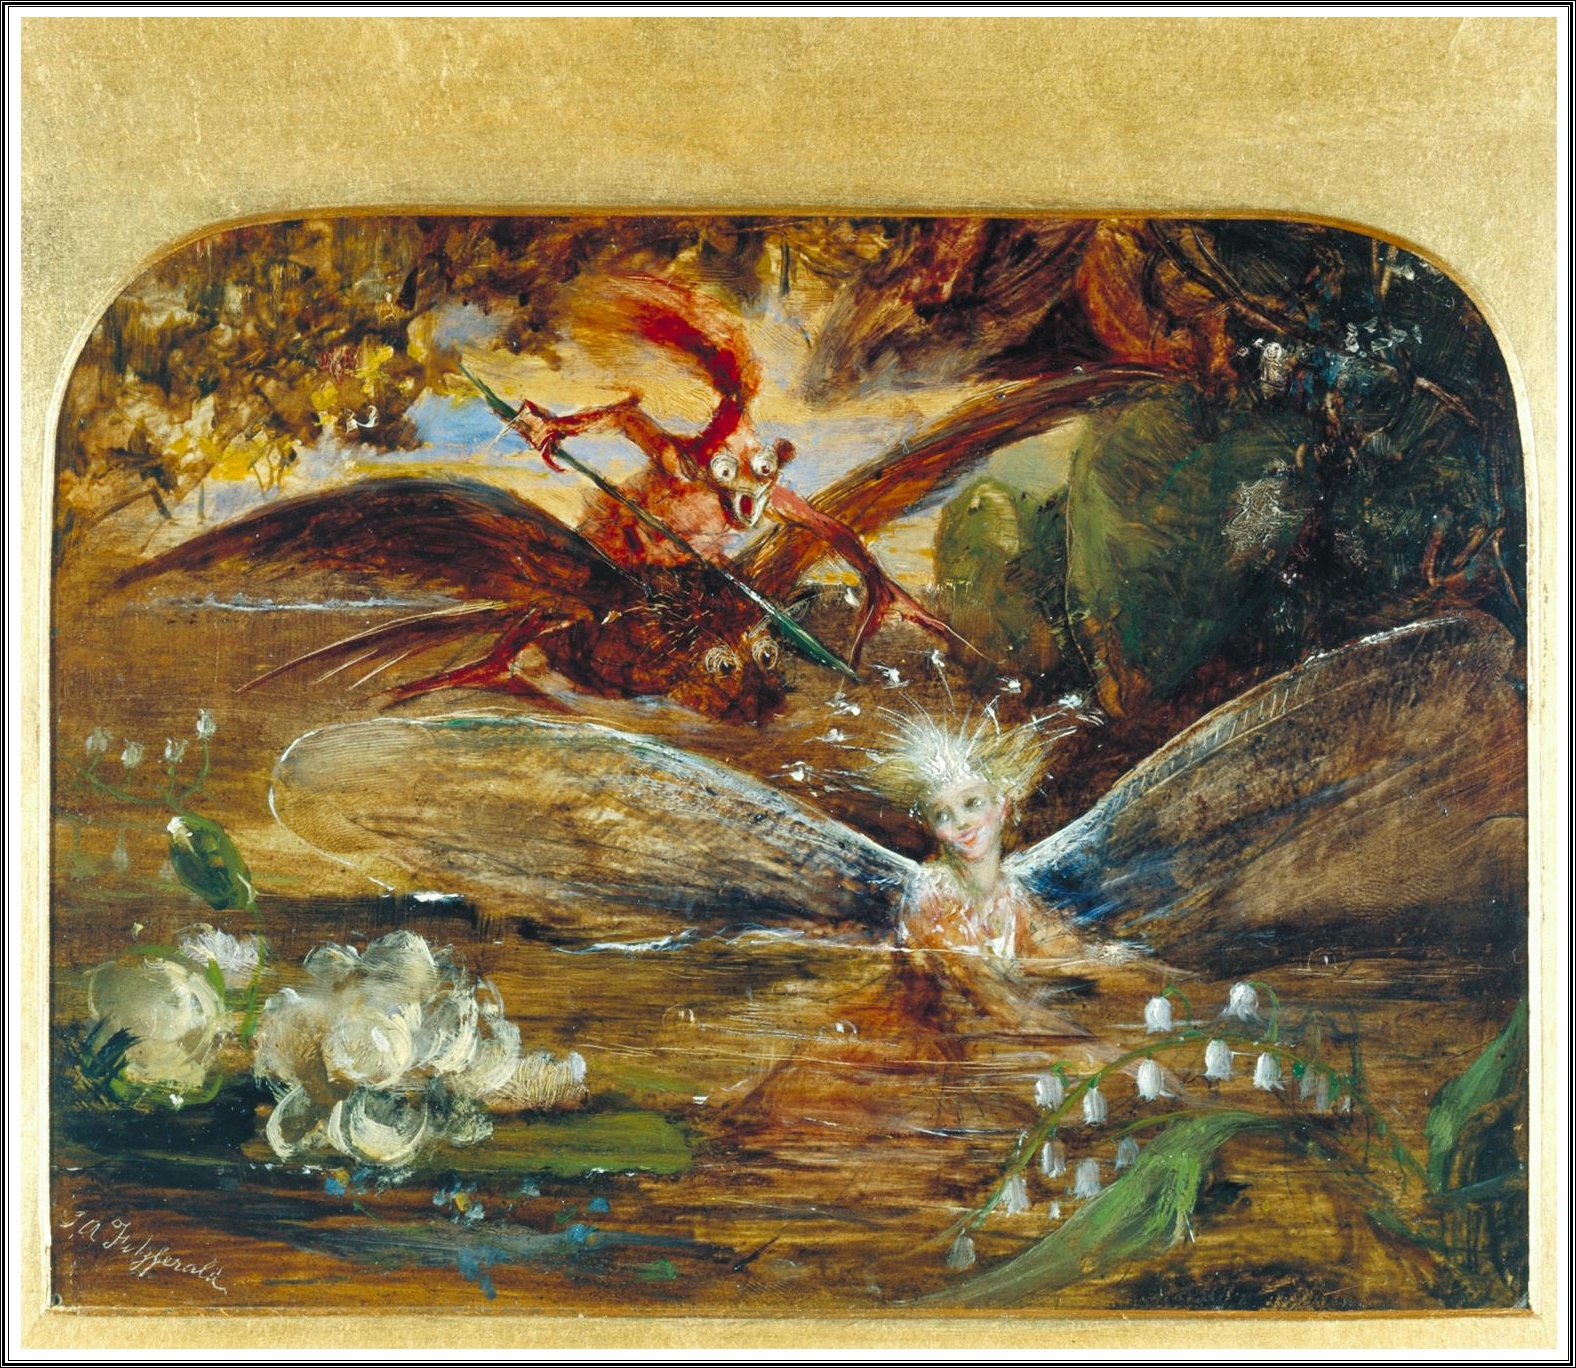 Mary Chaplin Artiste Peintre le prince lointain: john anster fitzgerald (1819-1906), the